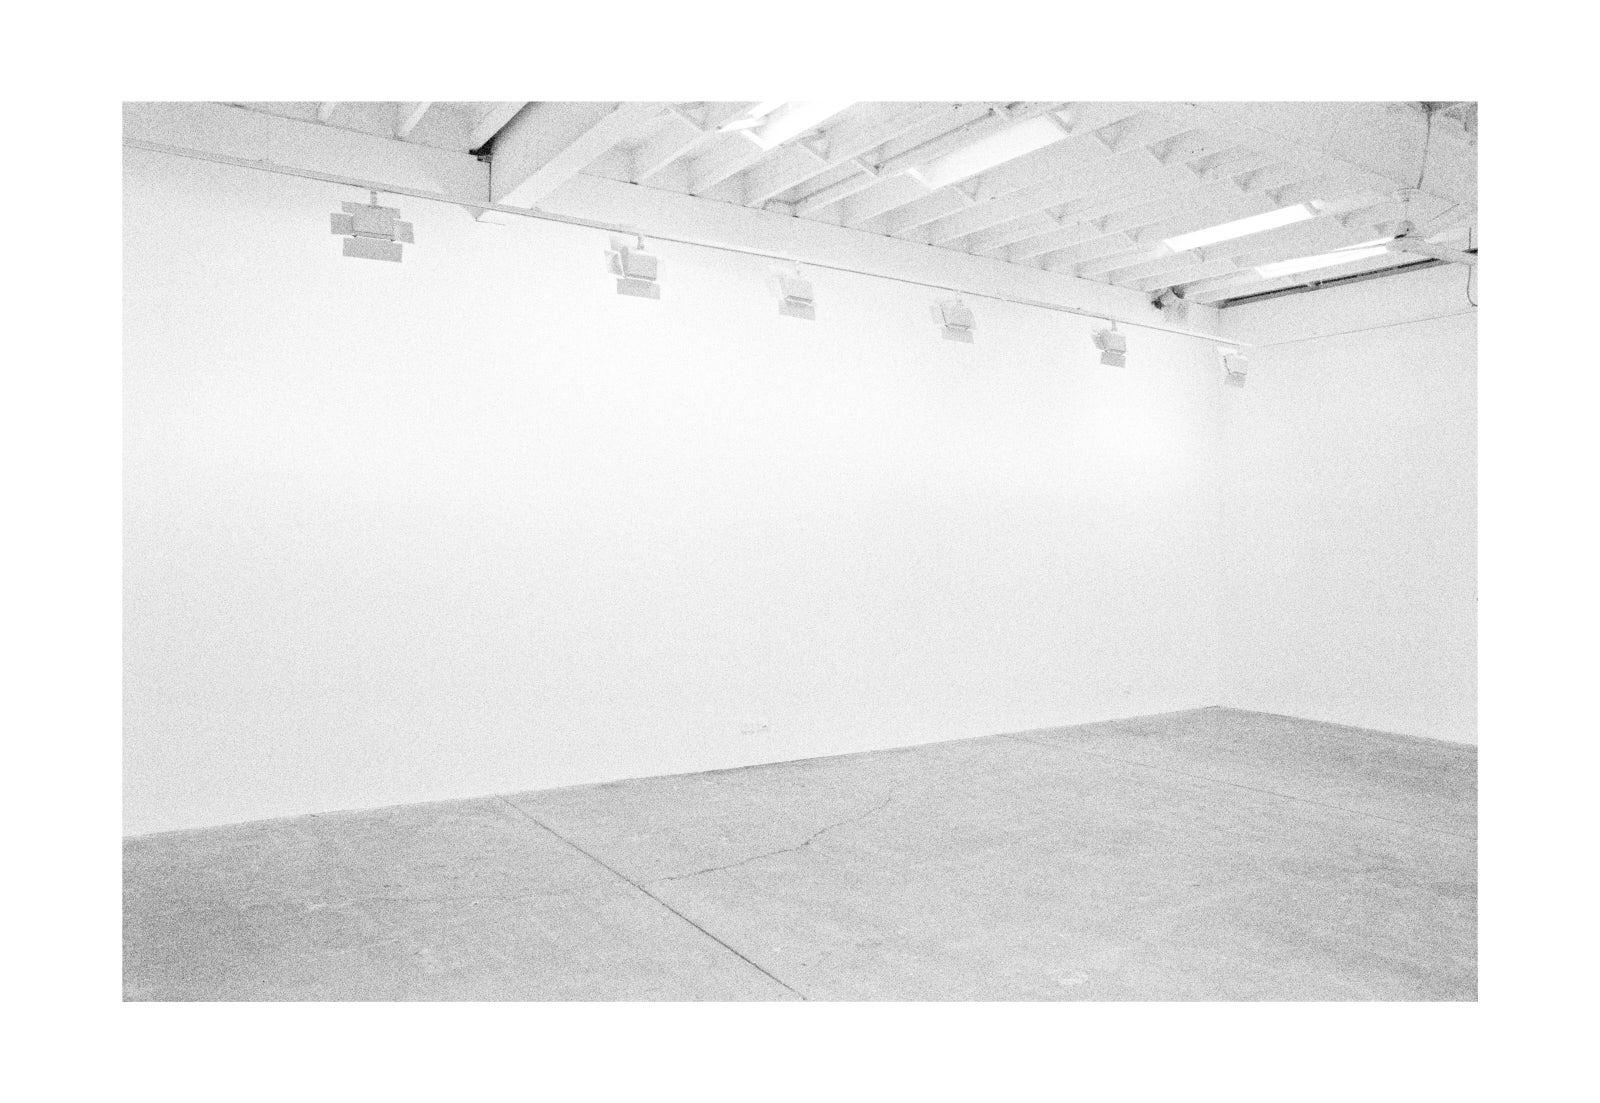 VCA Student Gallery , 2013.